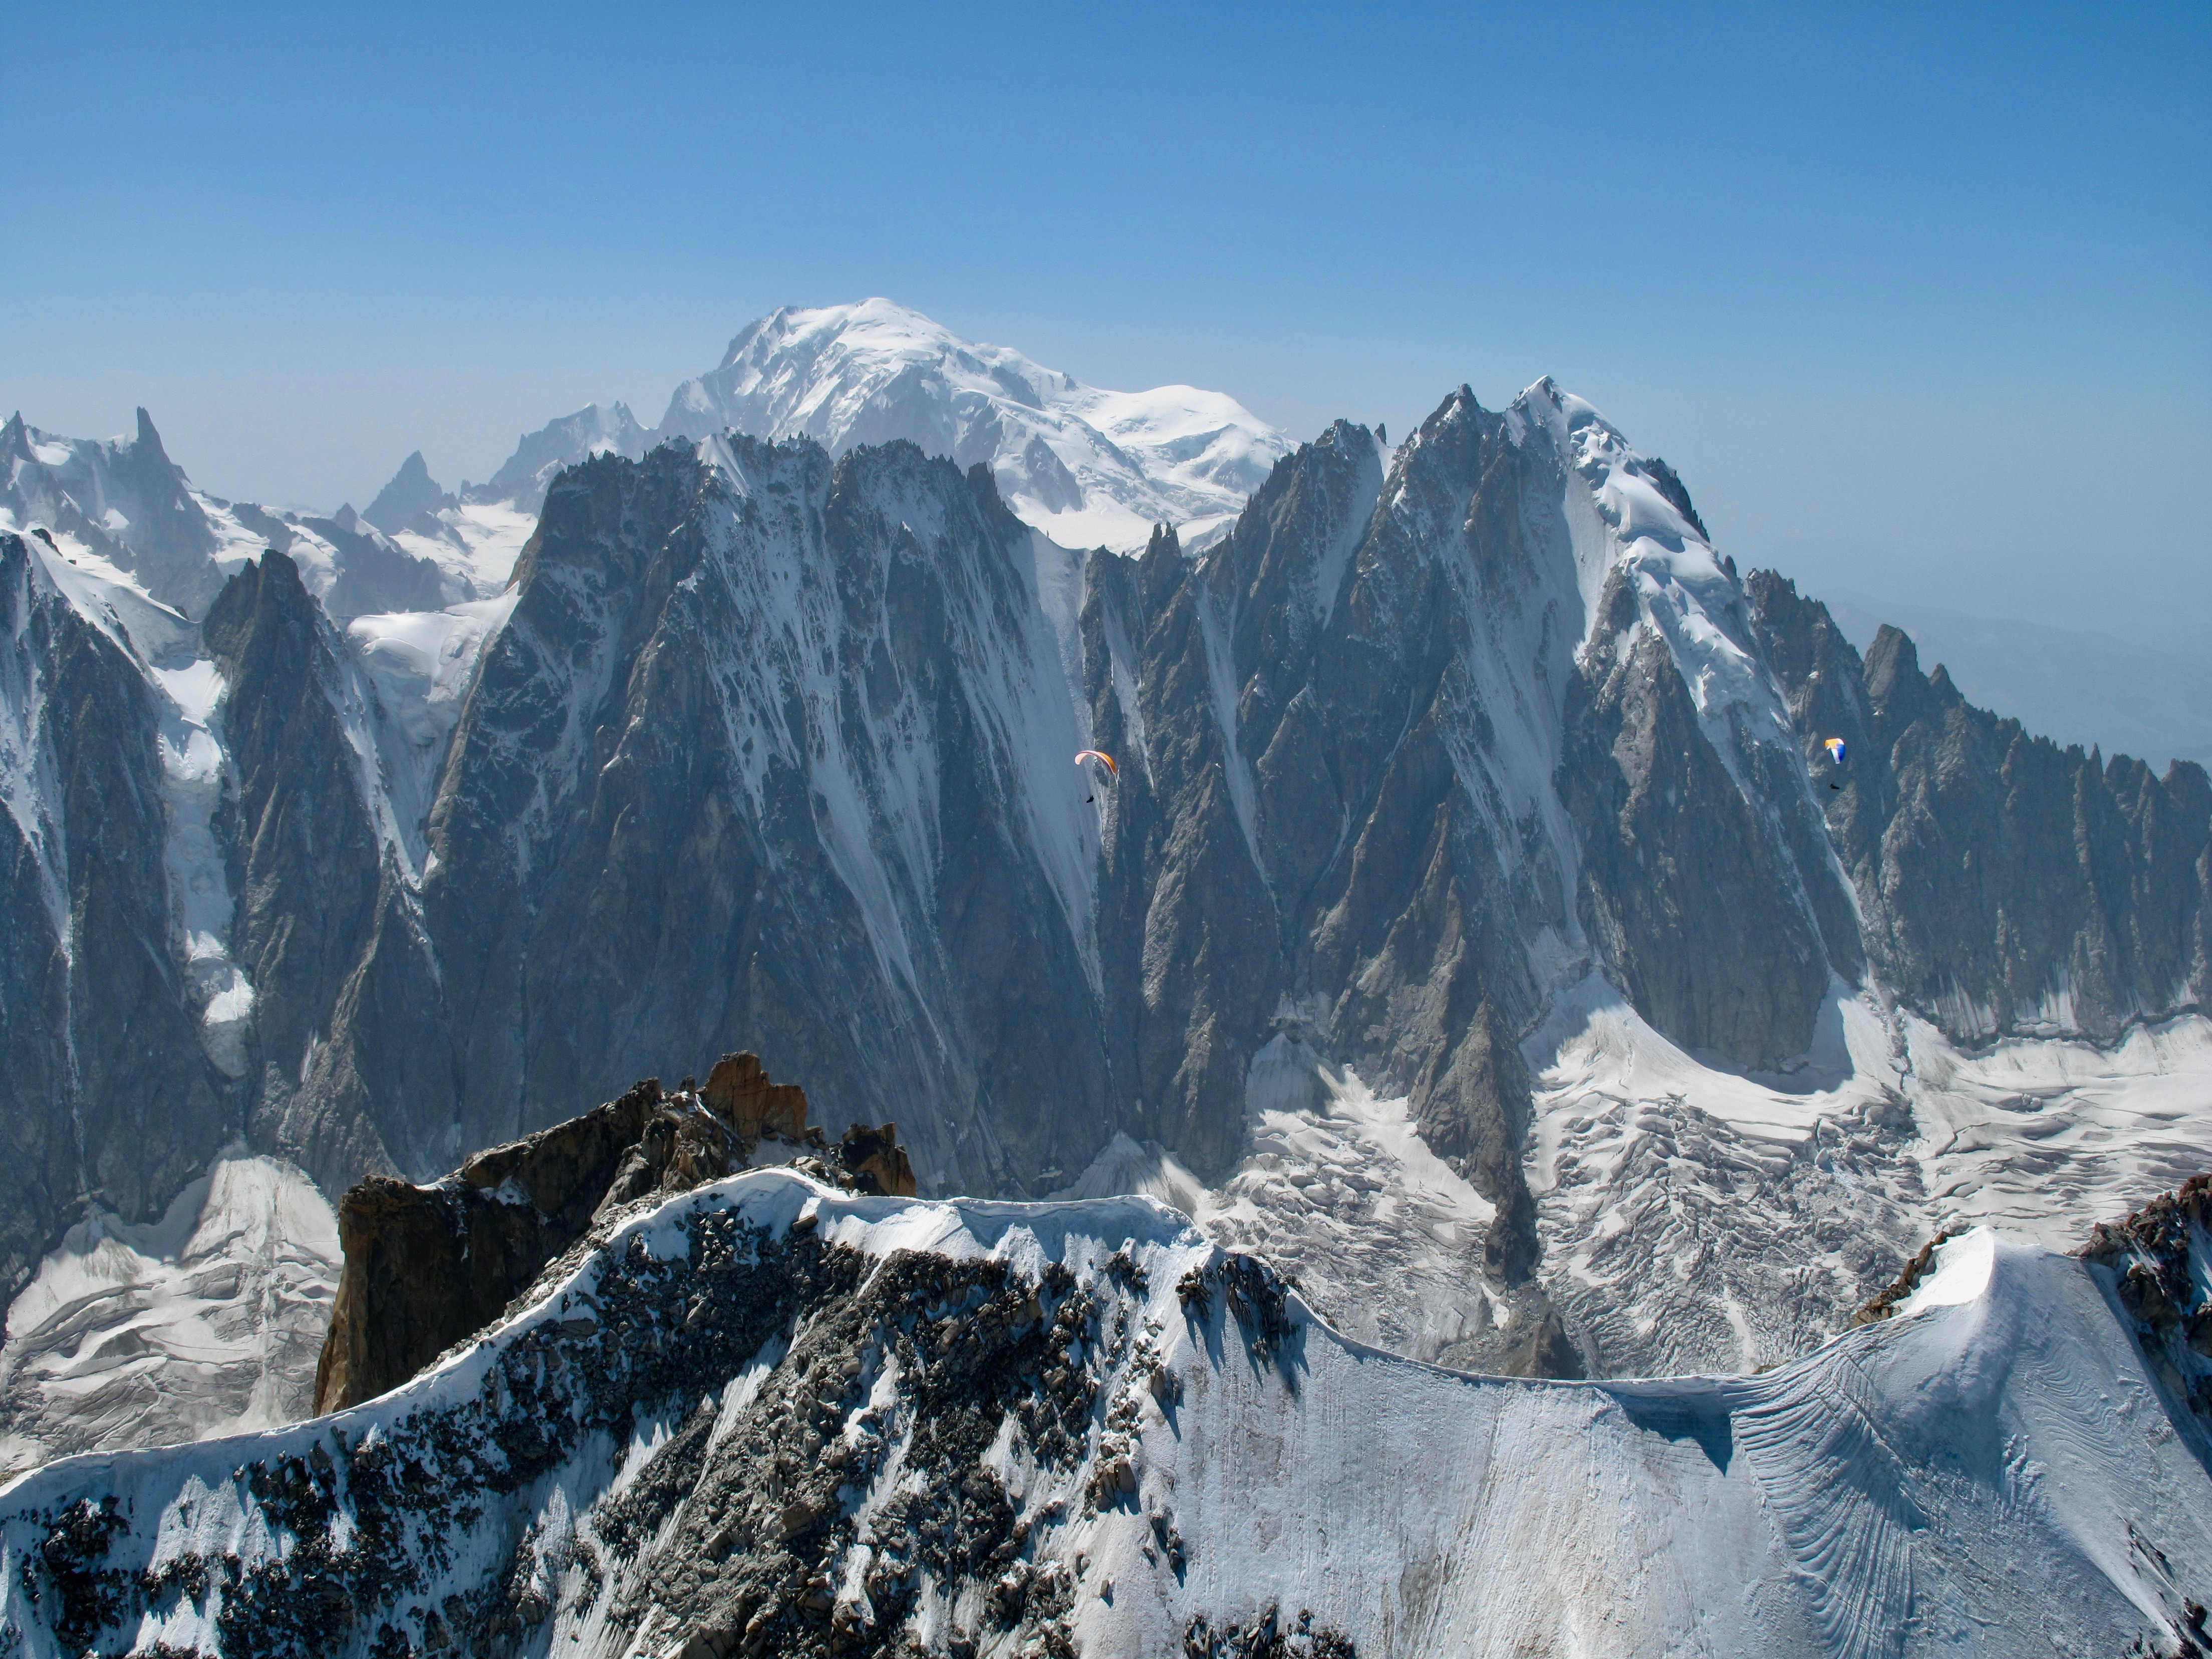 19.08.2012, Mont-Blanc